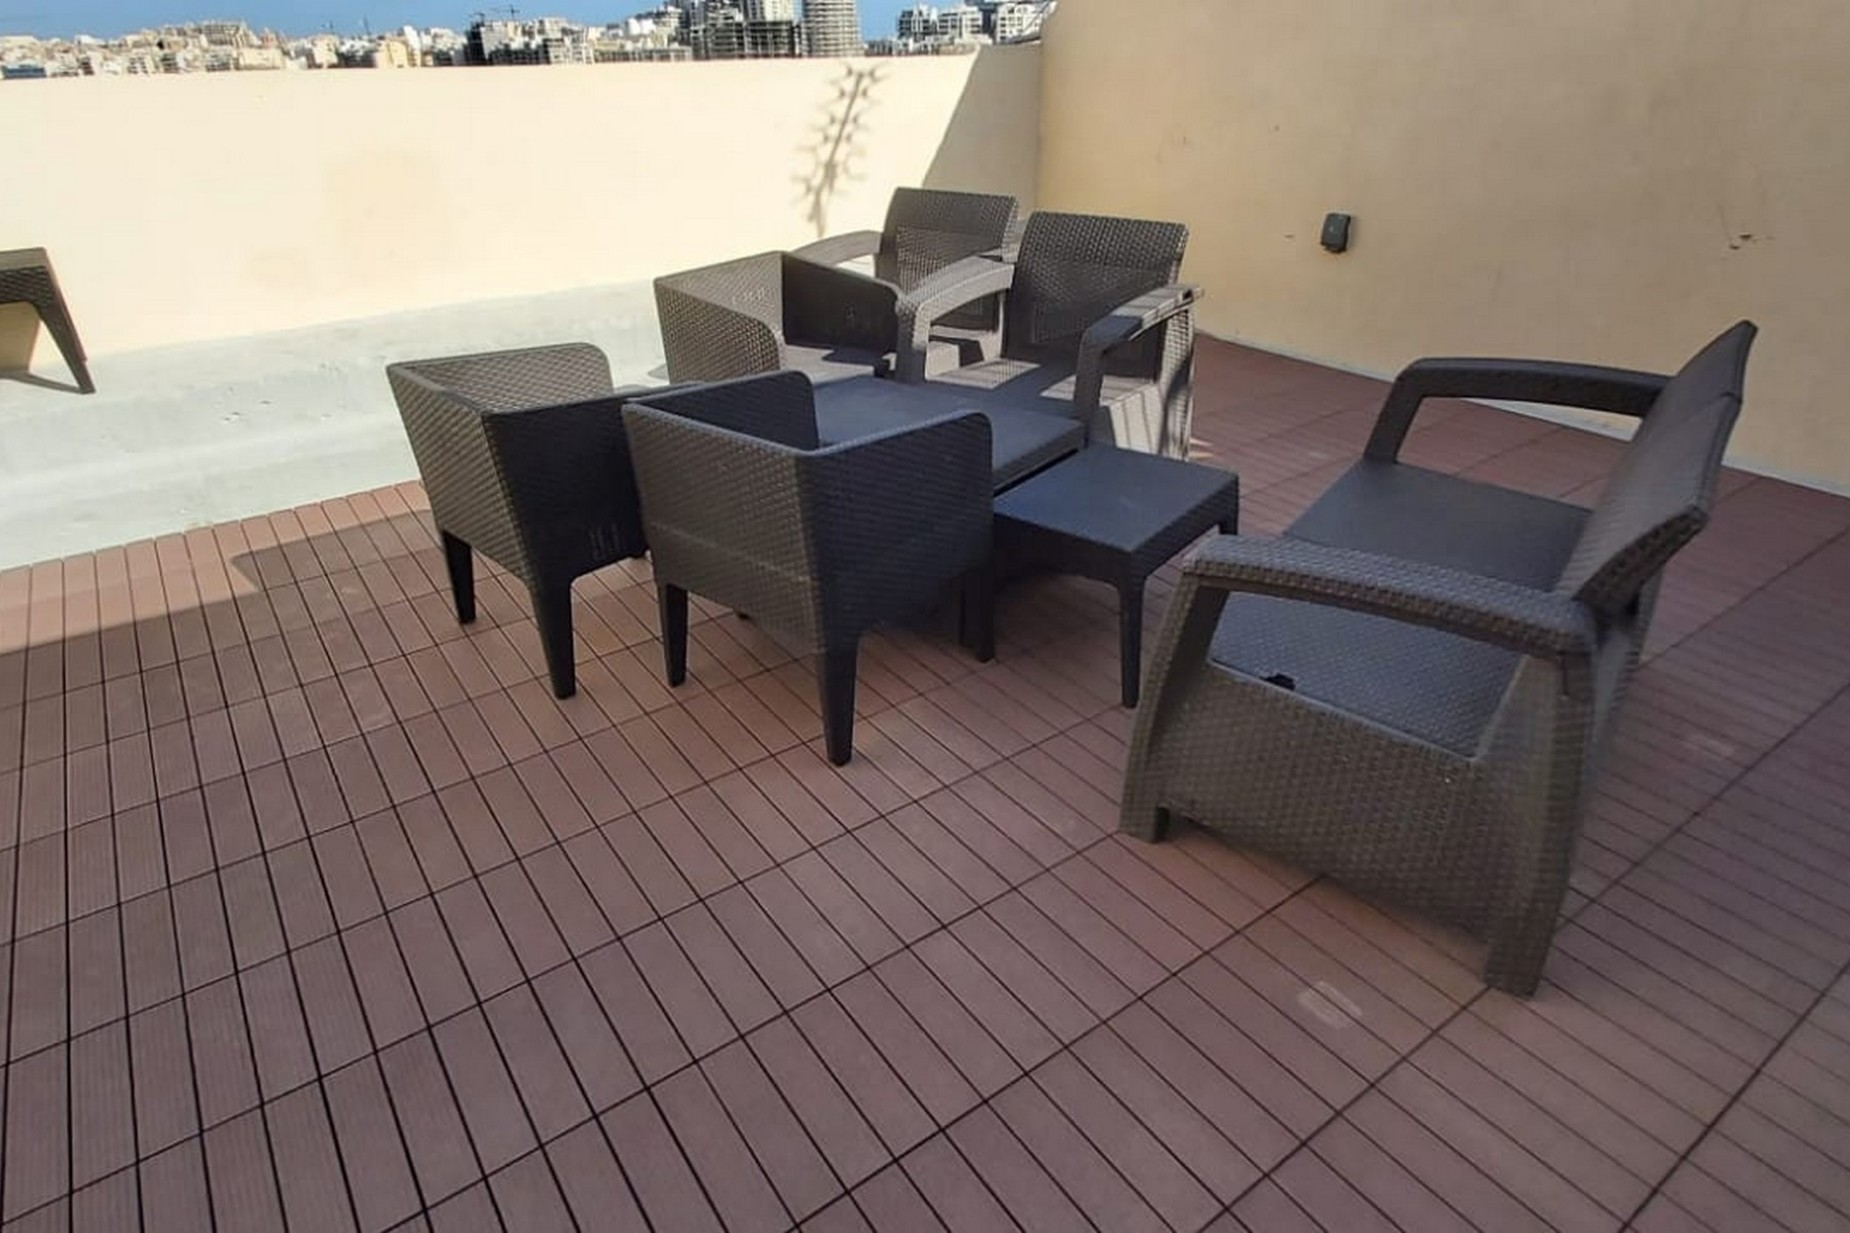 4 bed  For Sale in Valletta, Valletta - thumb 9